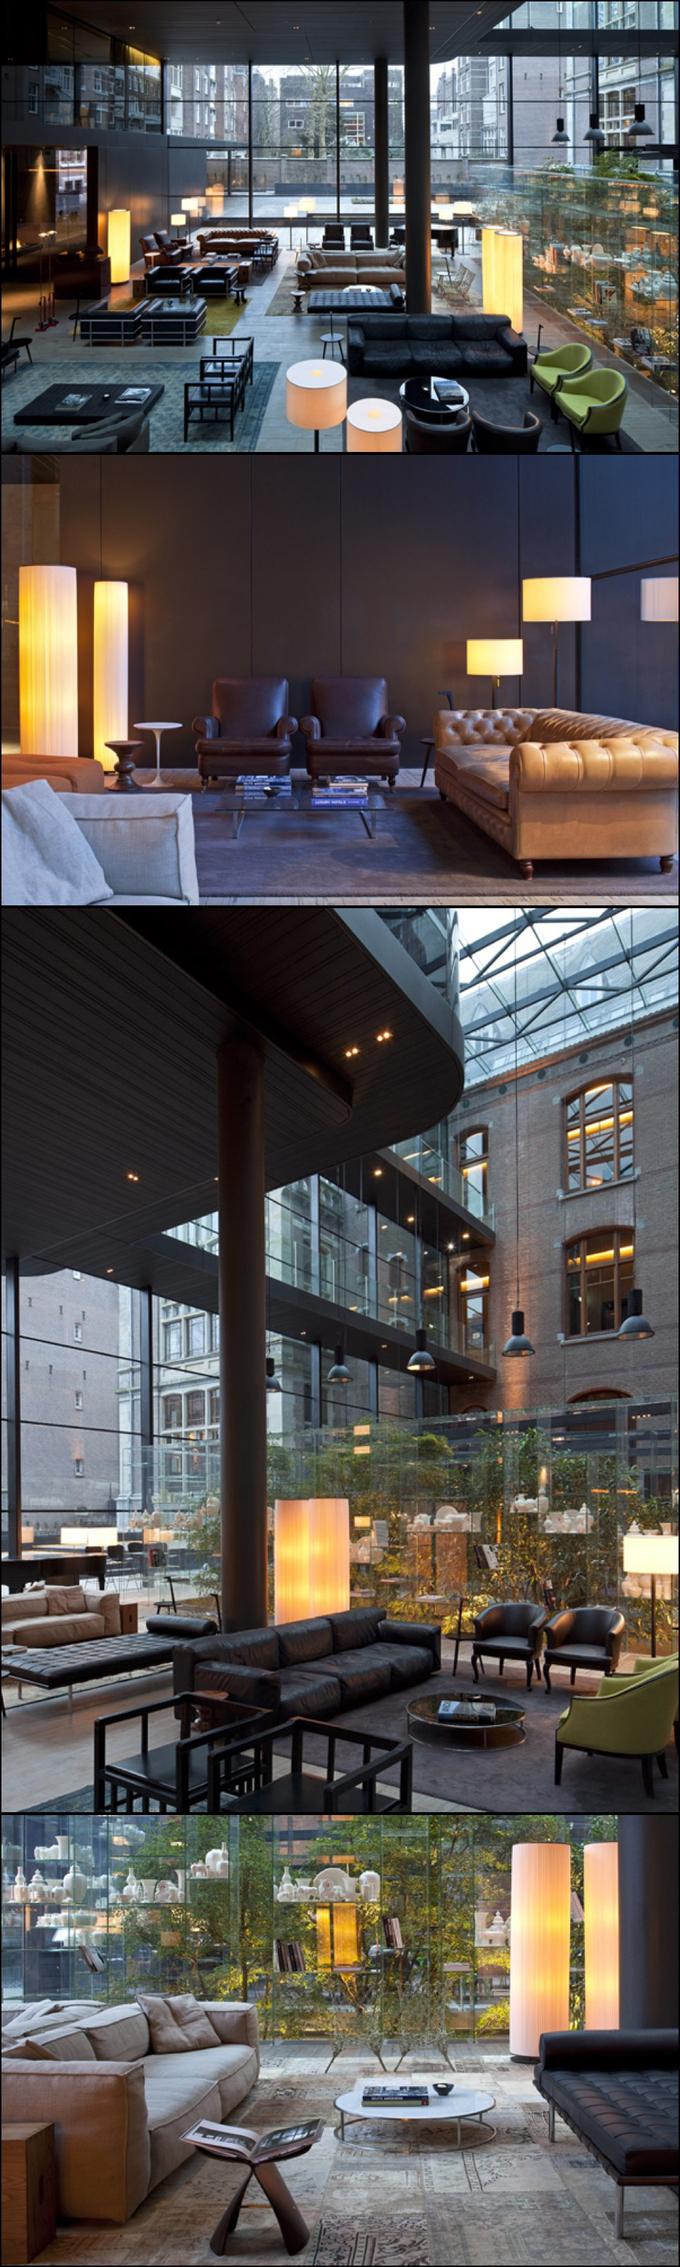 HTTP://呜呜呜.u如design.IT/index.PHP/2012/05/31/conservatorium-hotel-Amsterdam-皮尔哦-李三思哦你/